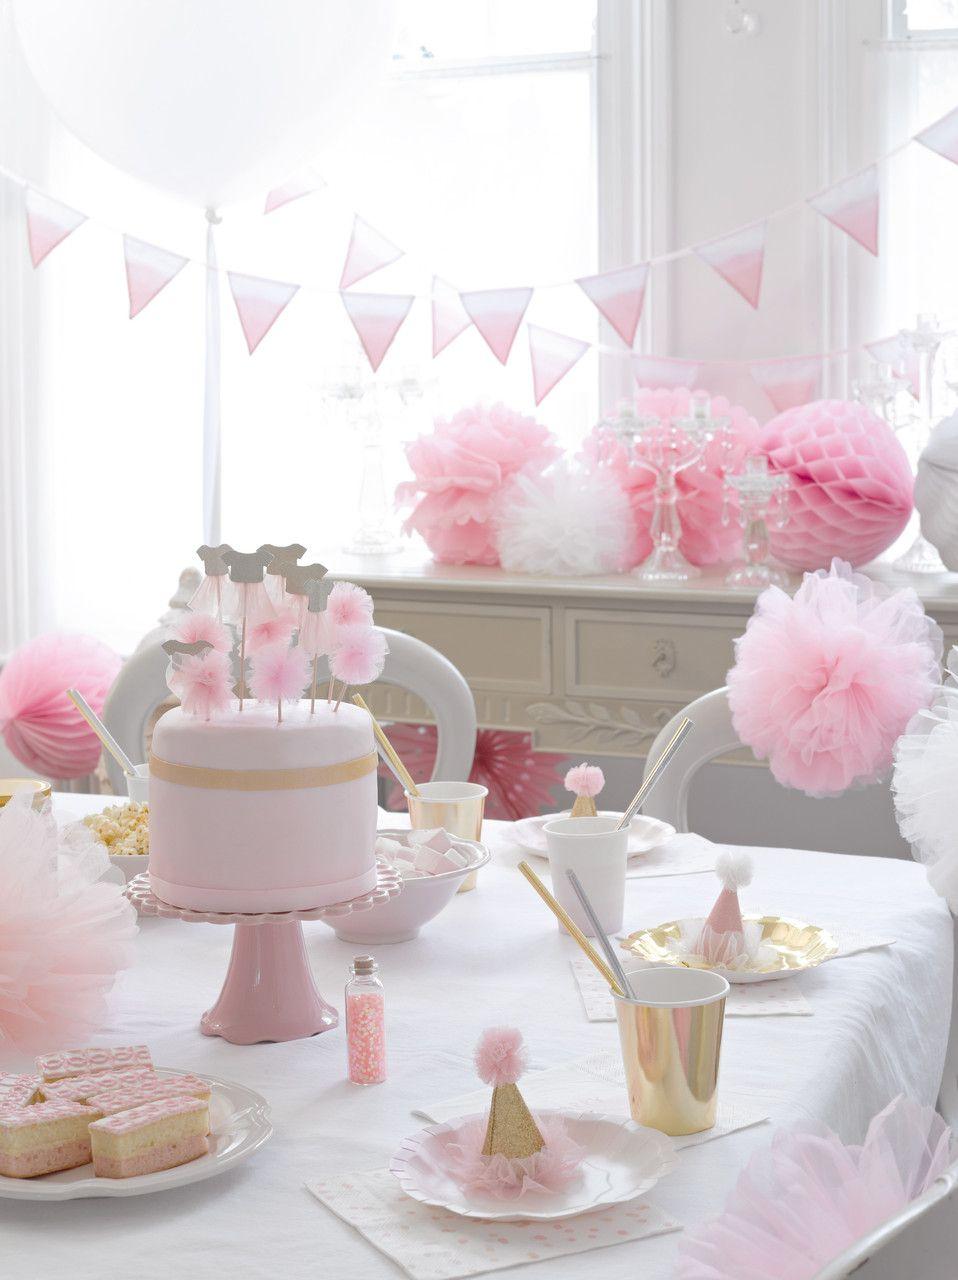 d coration anniversaire pastel rose pink birthday party anniversaire pastel pastel birthday. Black Bedroom Furniture Sets. Home Design Ideas